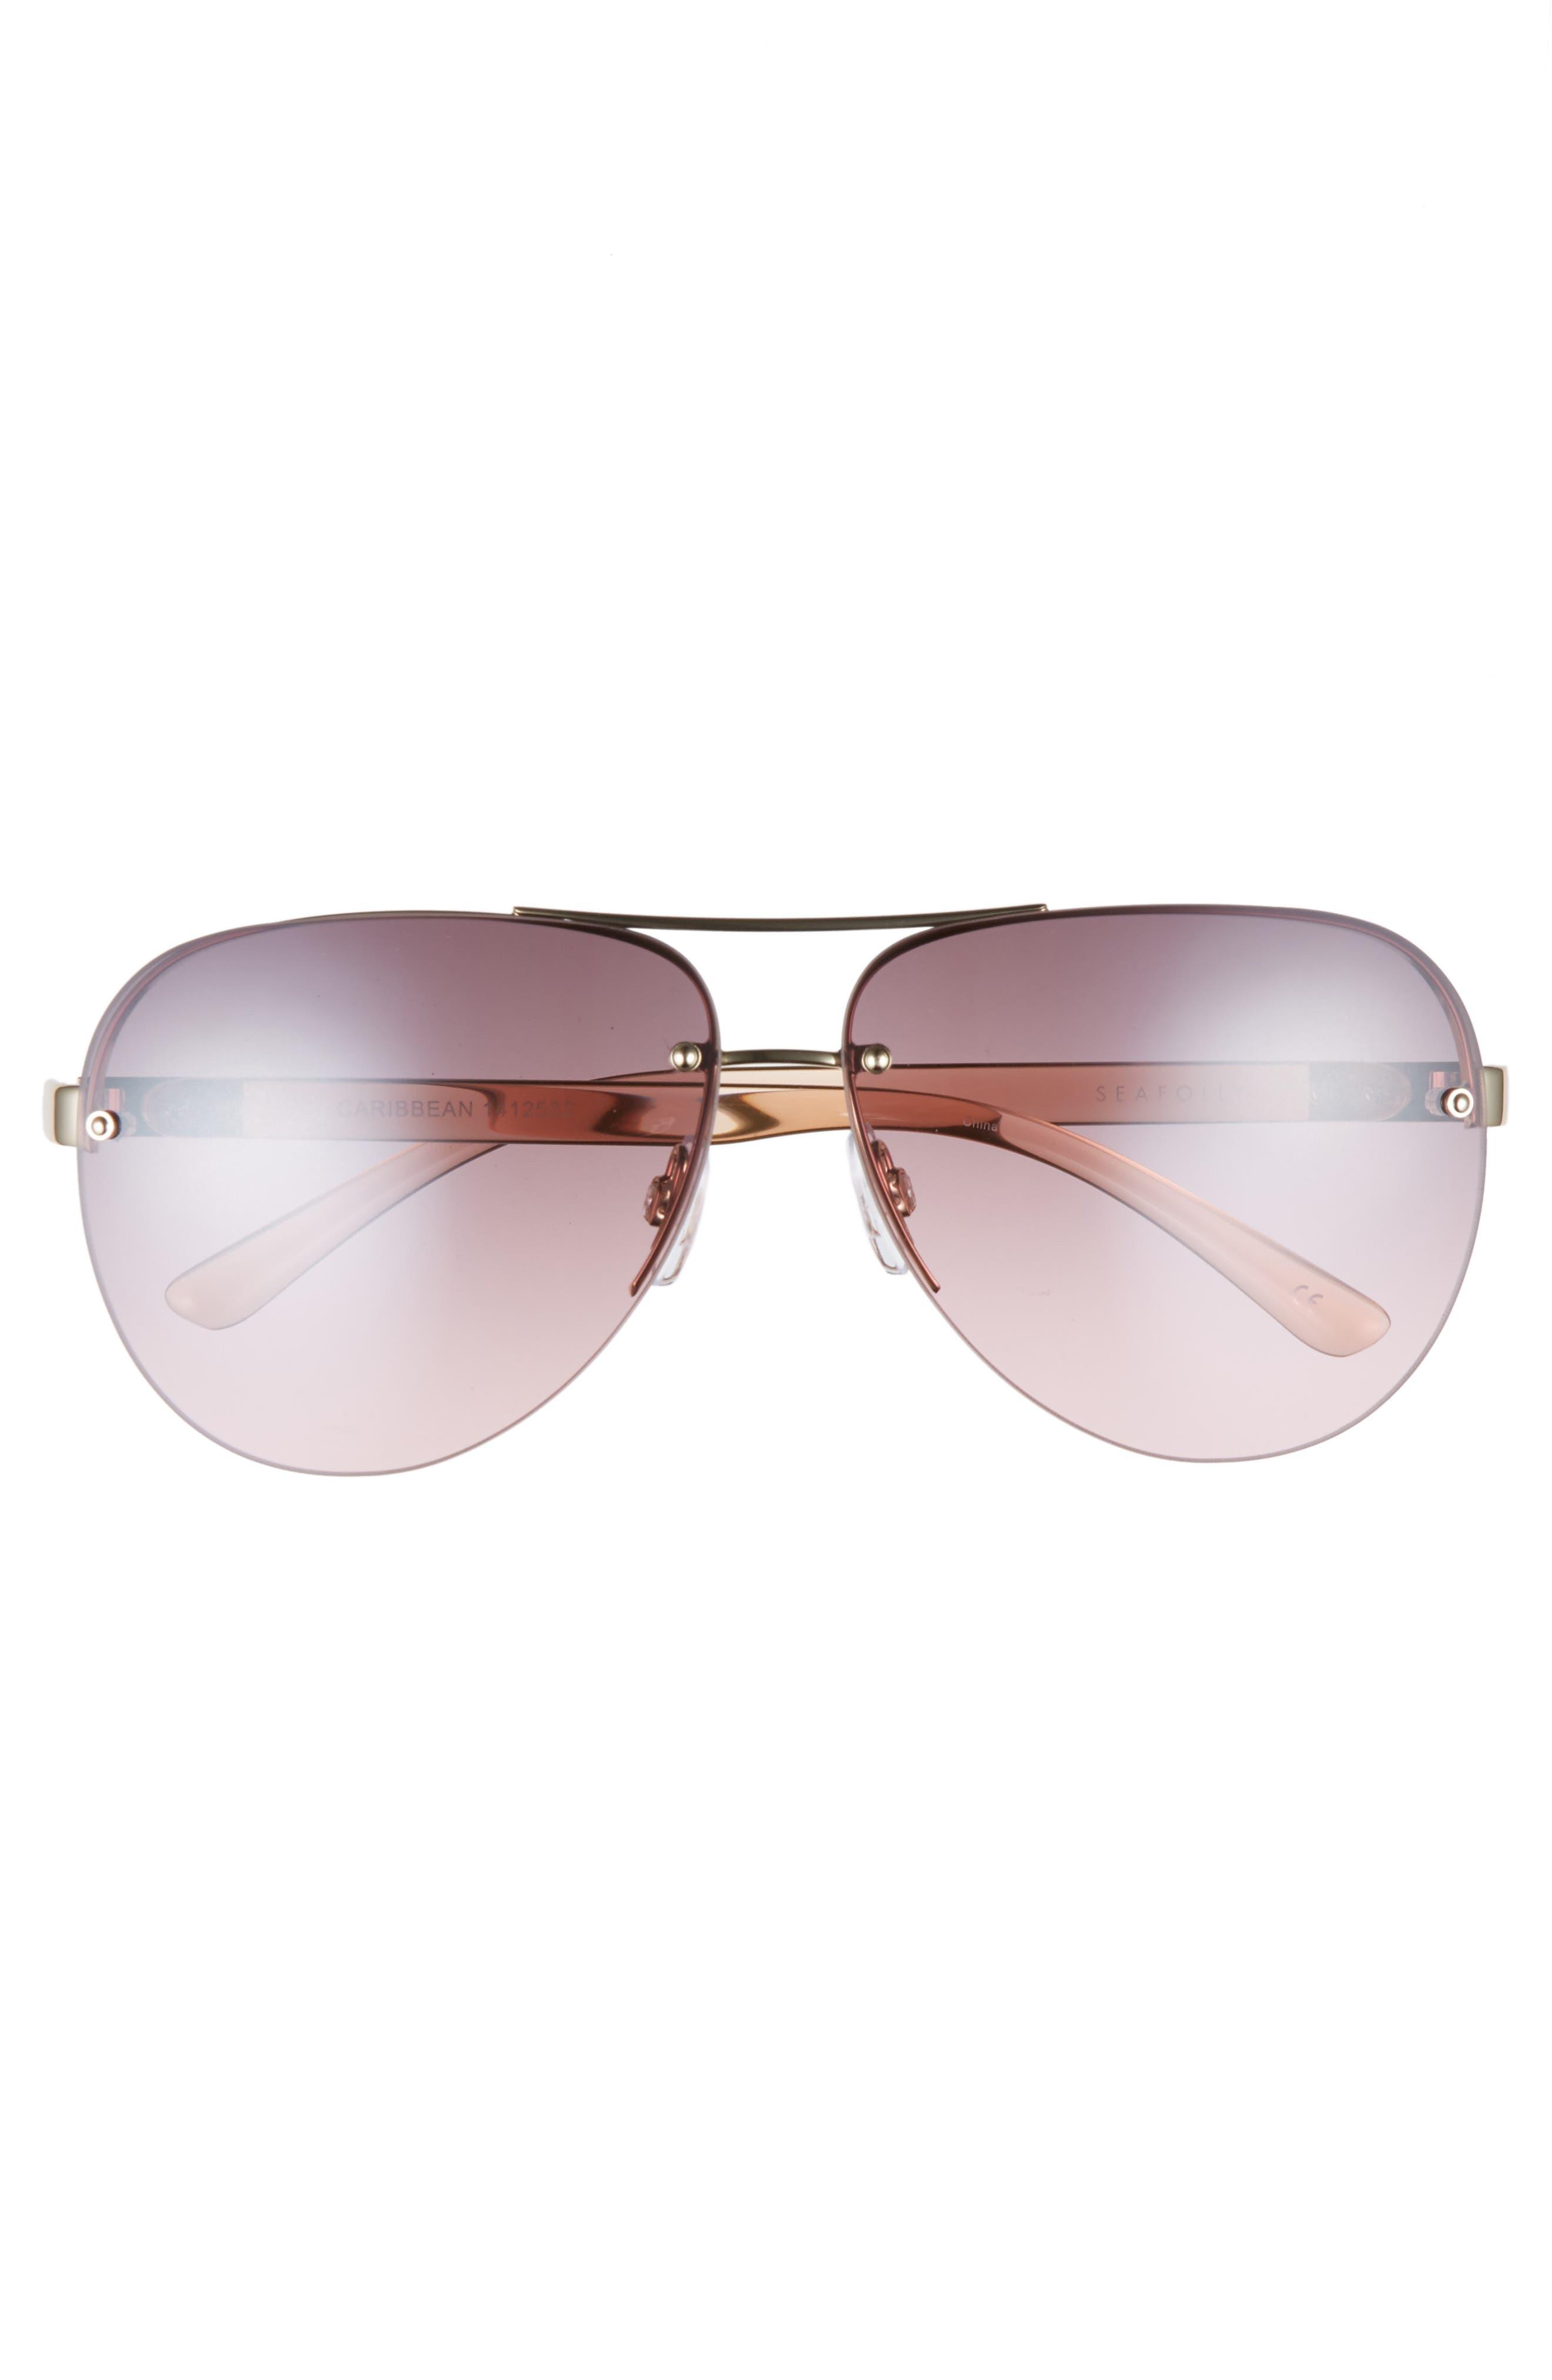 Caribbean 62mm Rimless Aviator Sunglasses,                             Alternate thumbnail 3, color,                             Gold